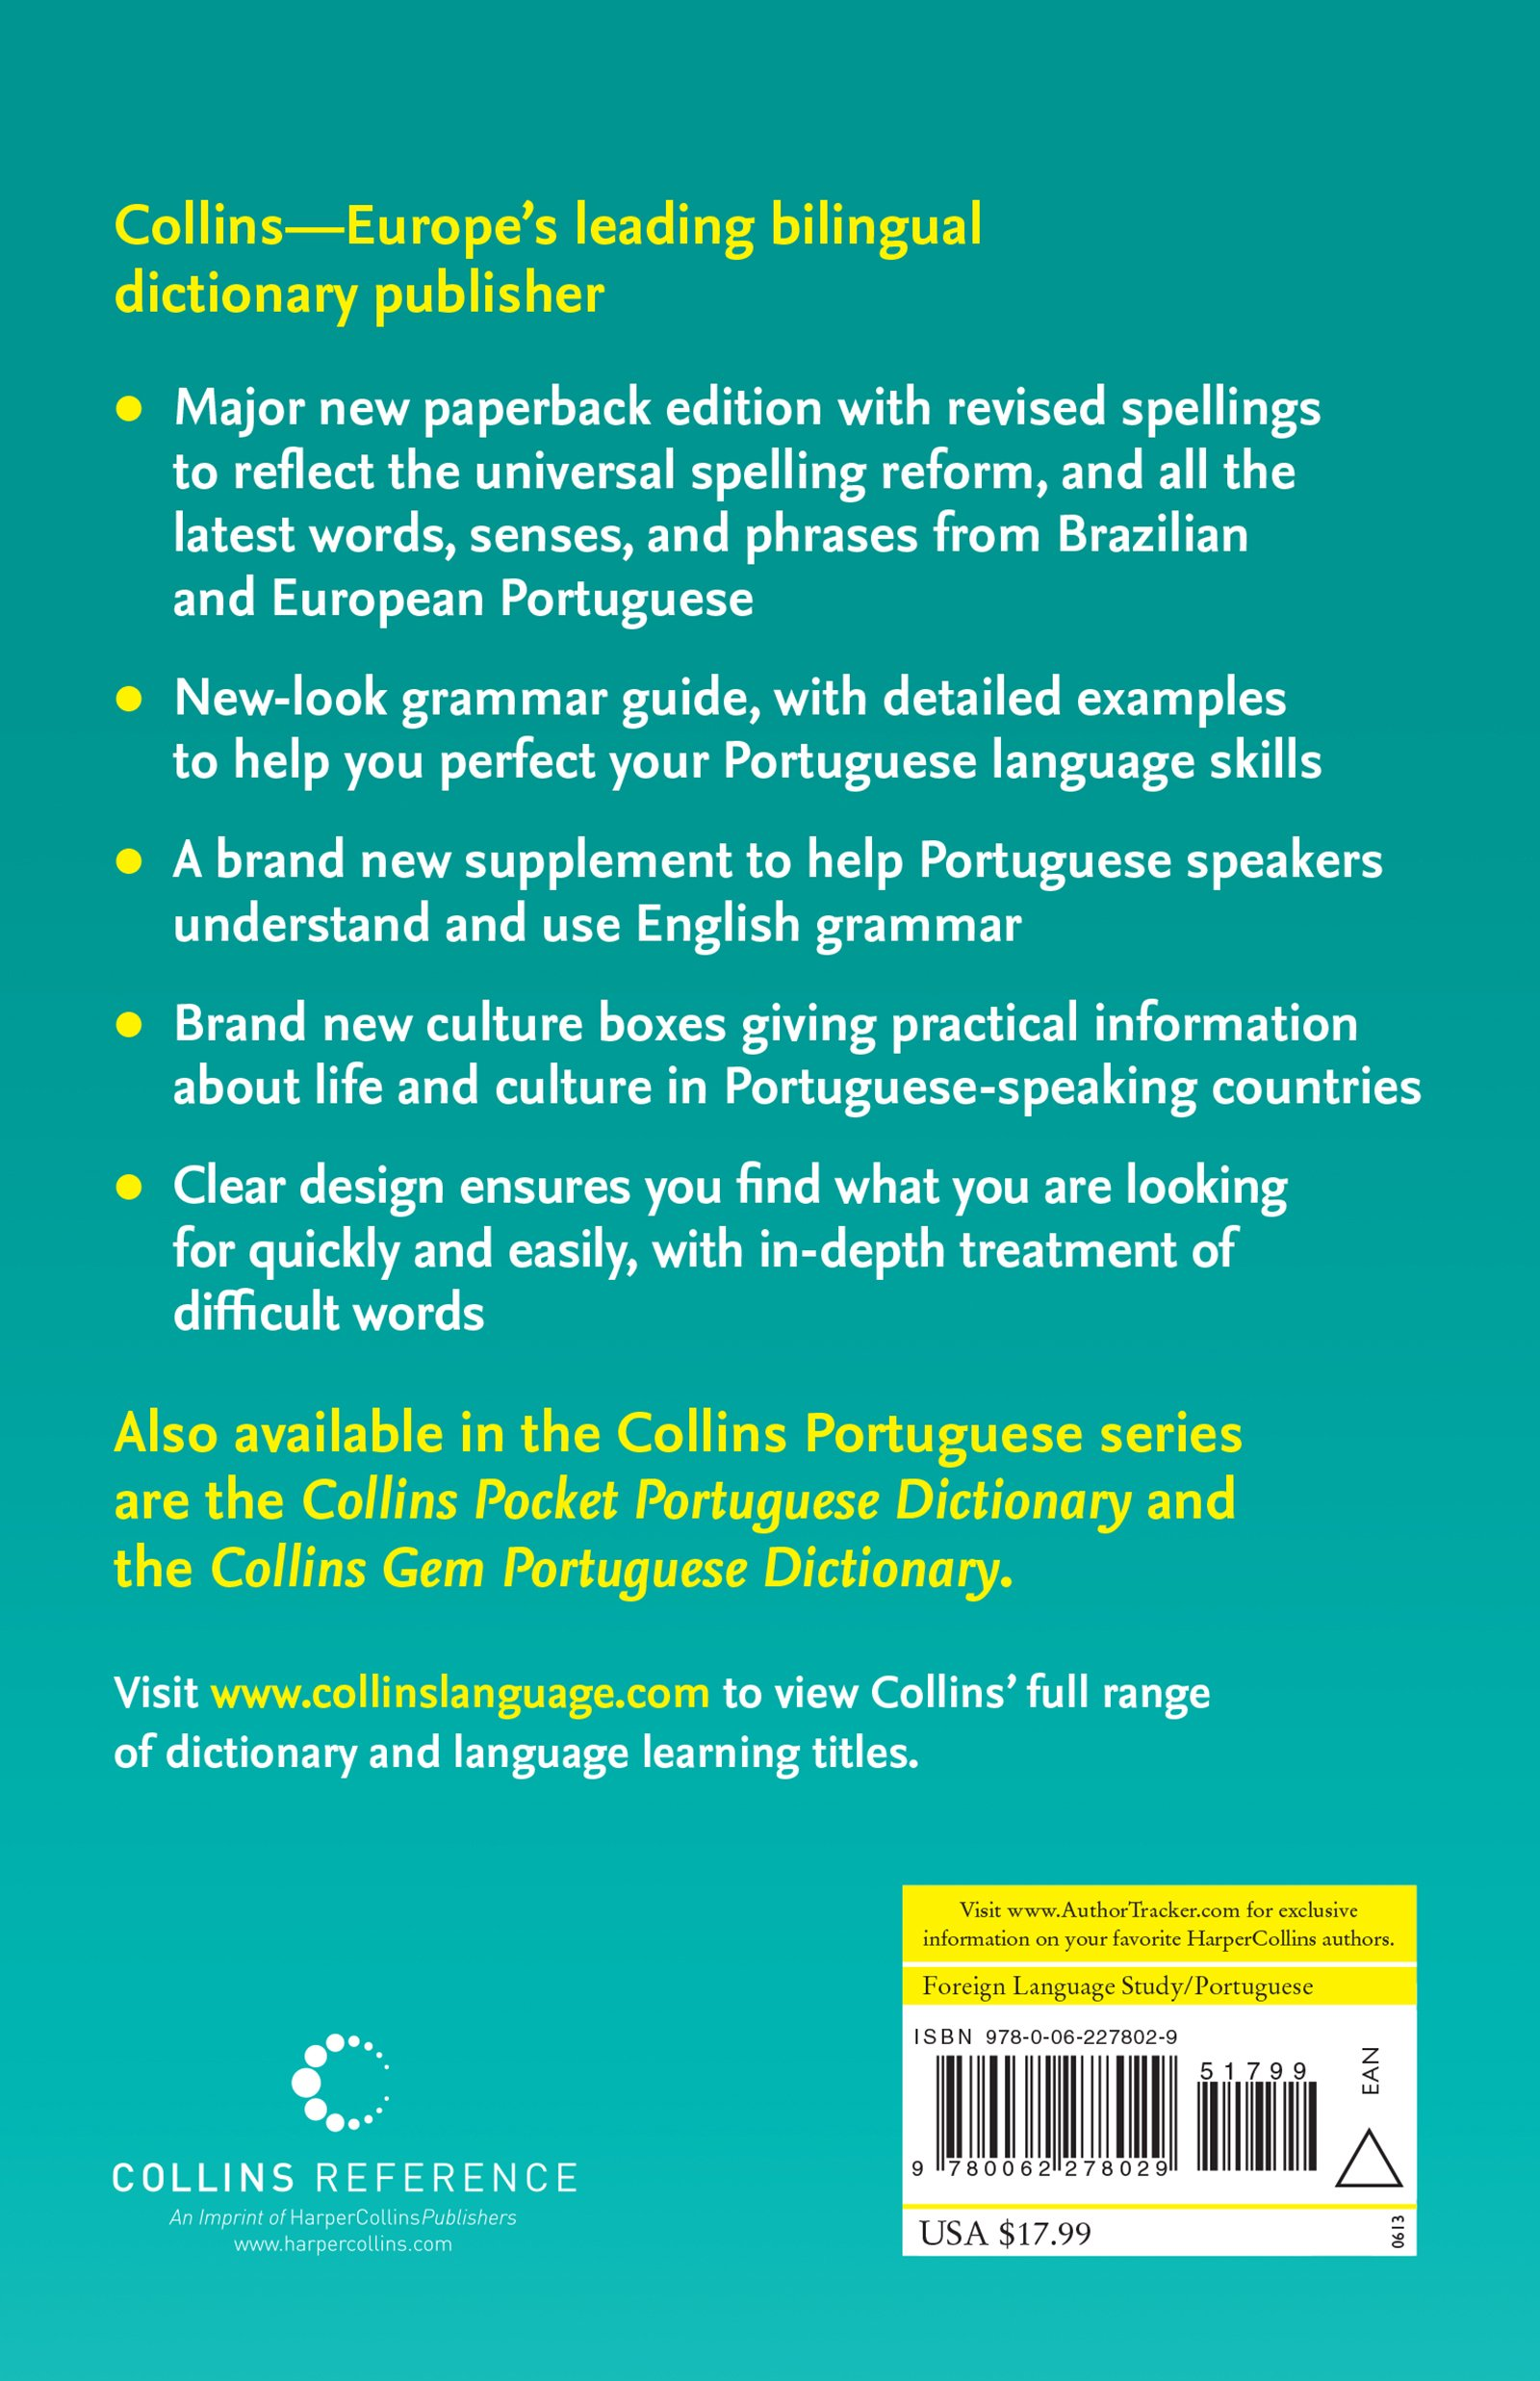 Collins Portuguese Dictionary & Grammar: Amazon.co.uk: Harpercollins  Publishers Ltd: 9780062278029: Books